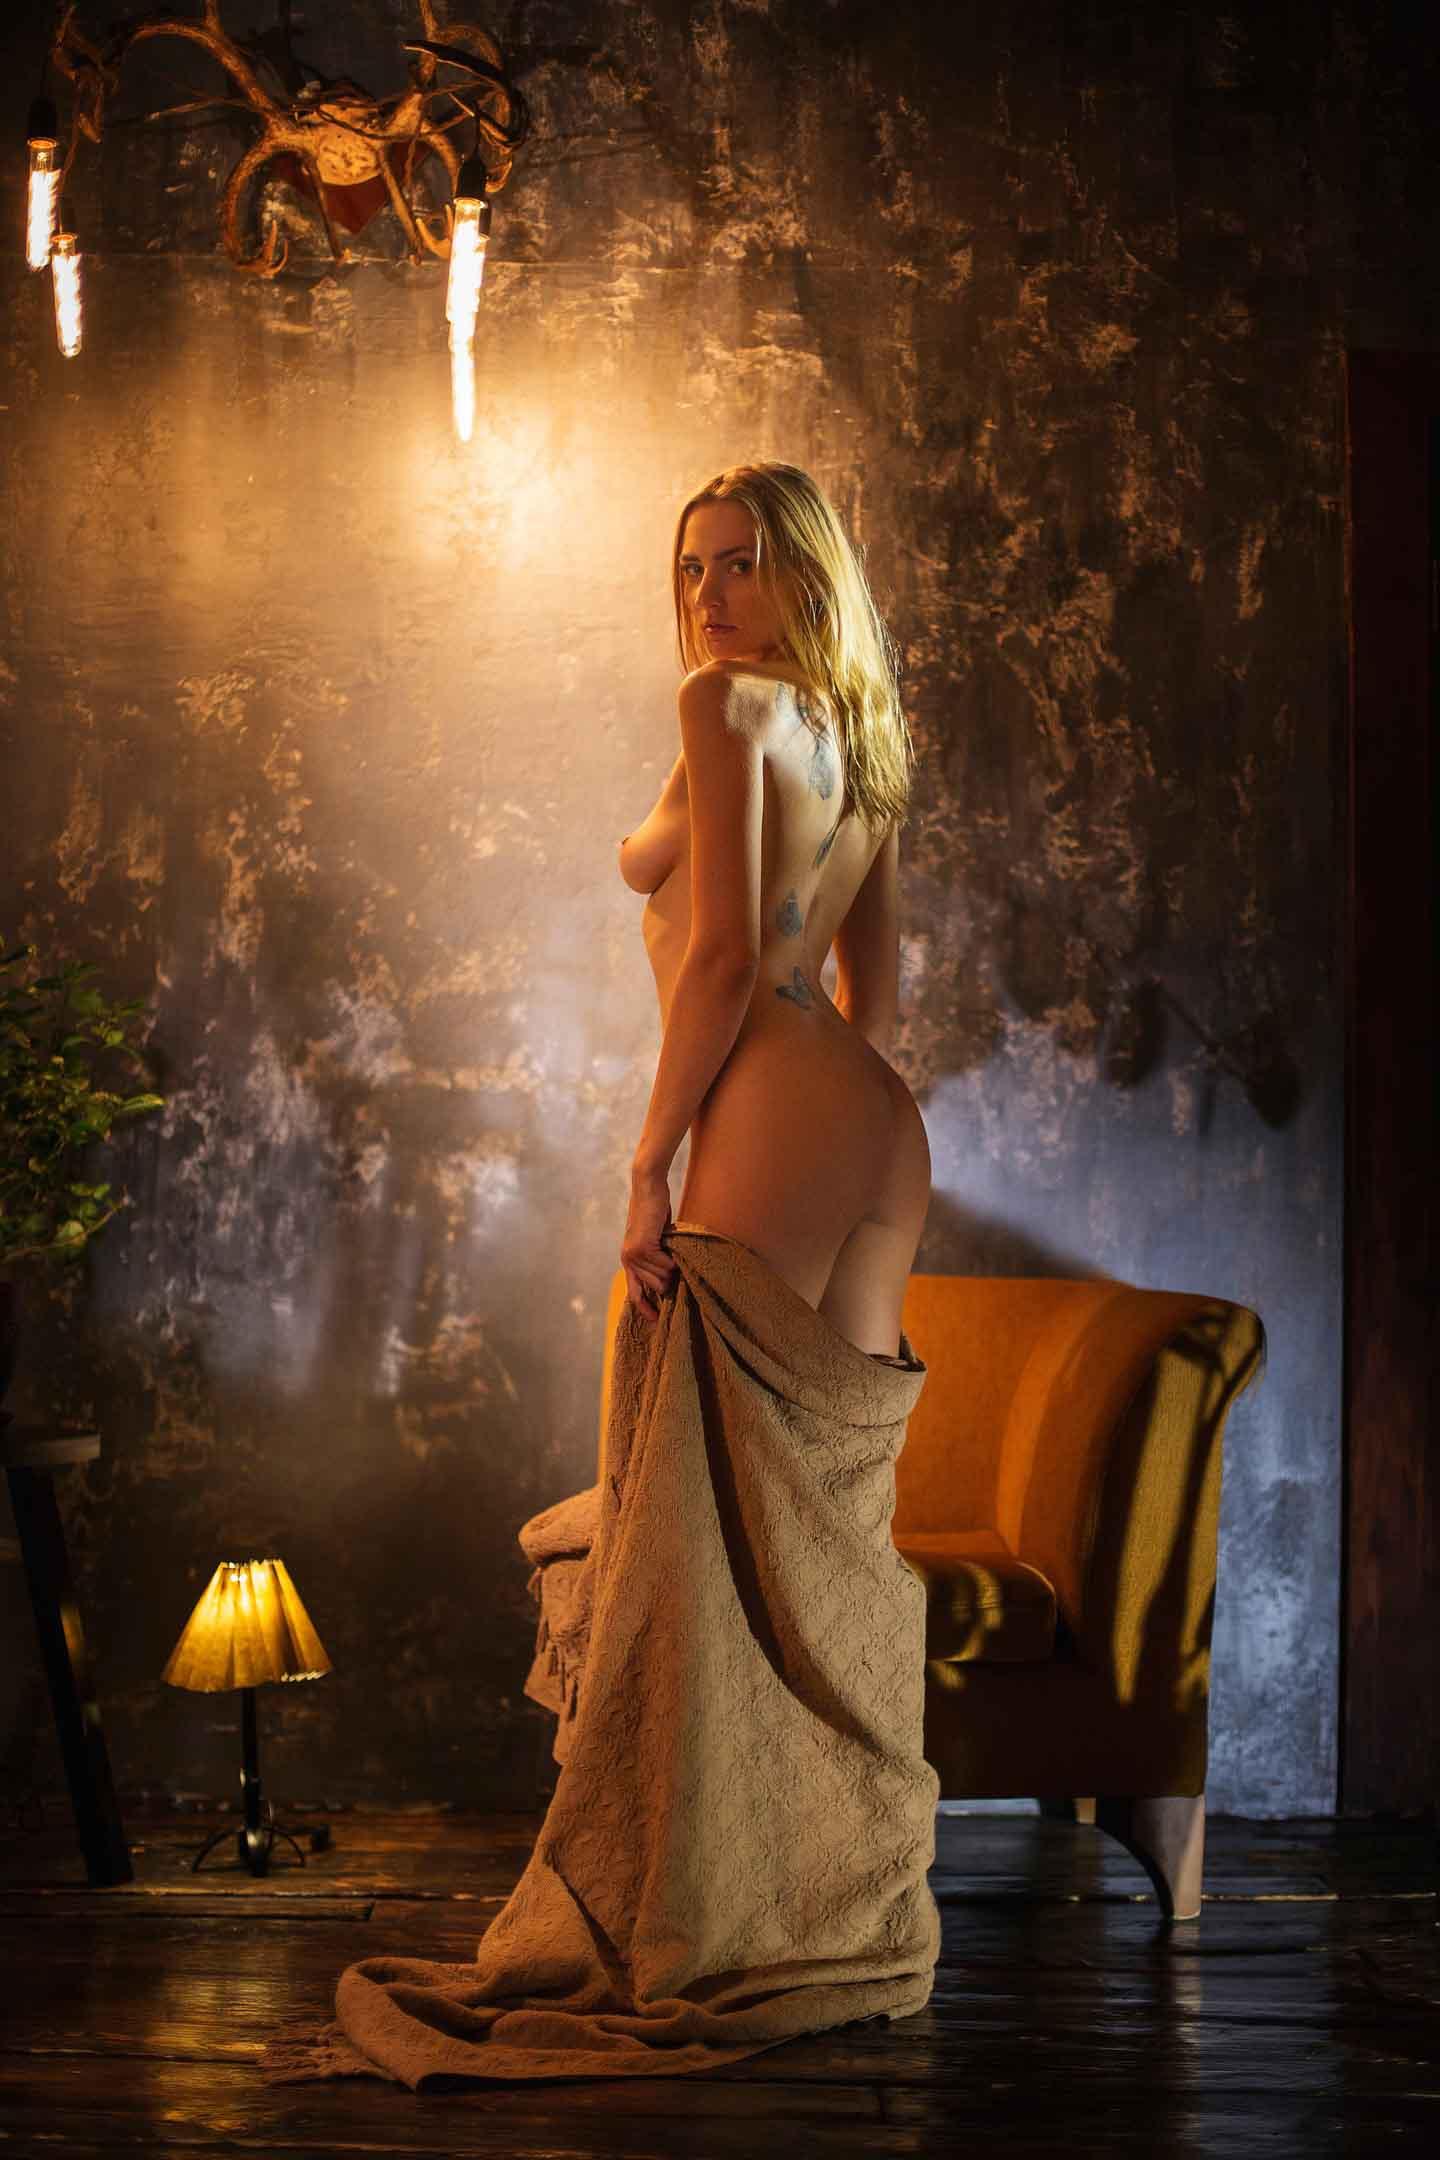 Anna Vladimirovna - Maxim Chuprin photoshoot